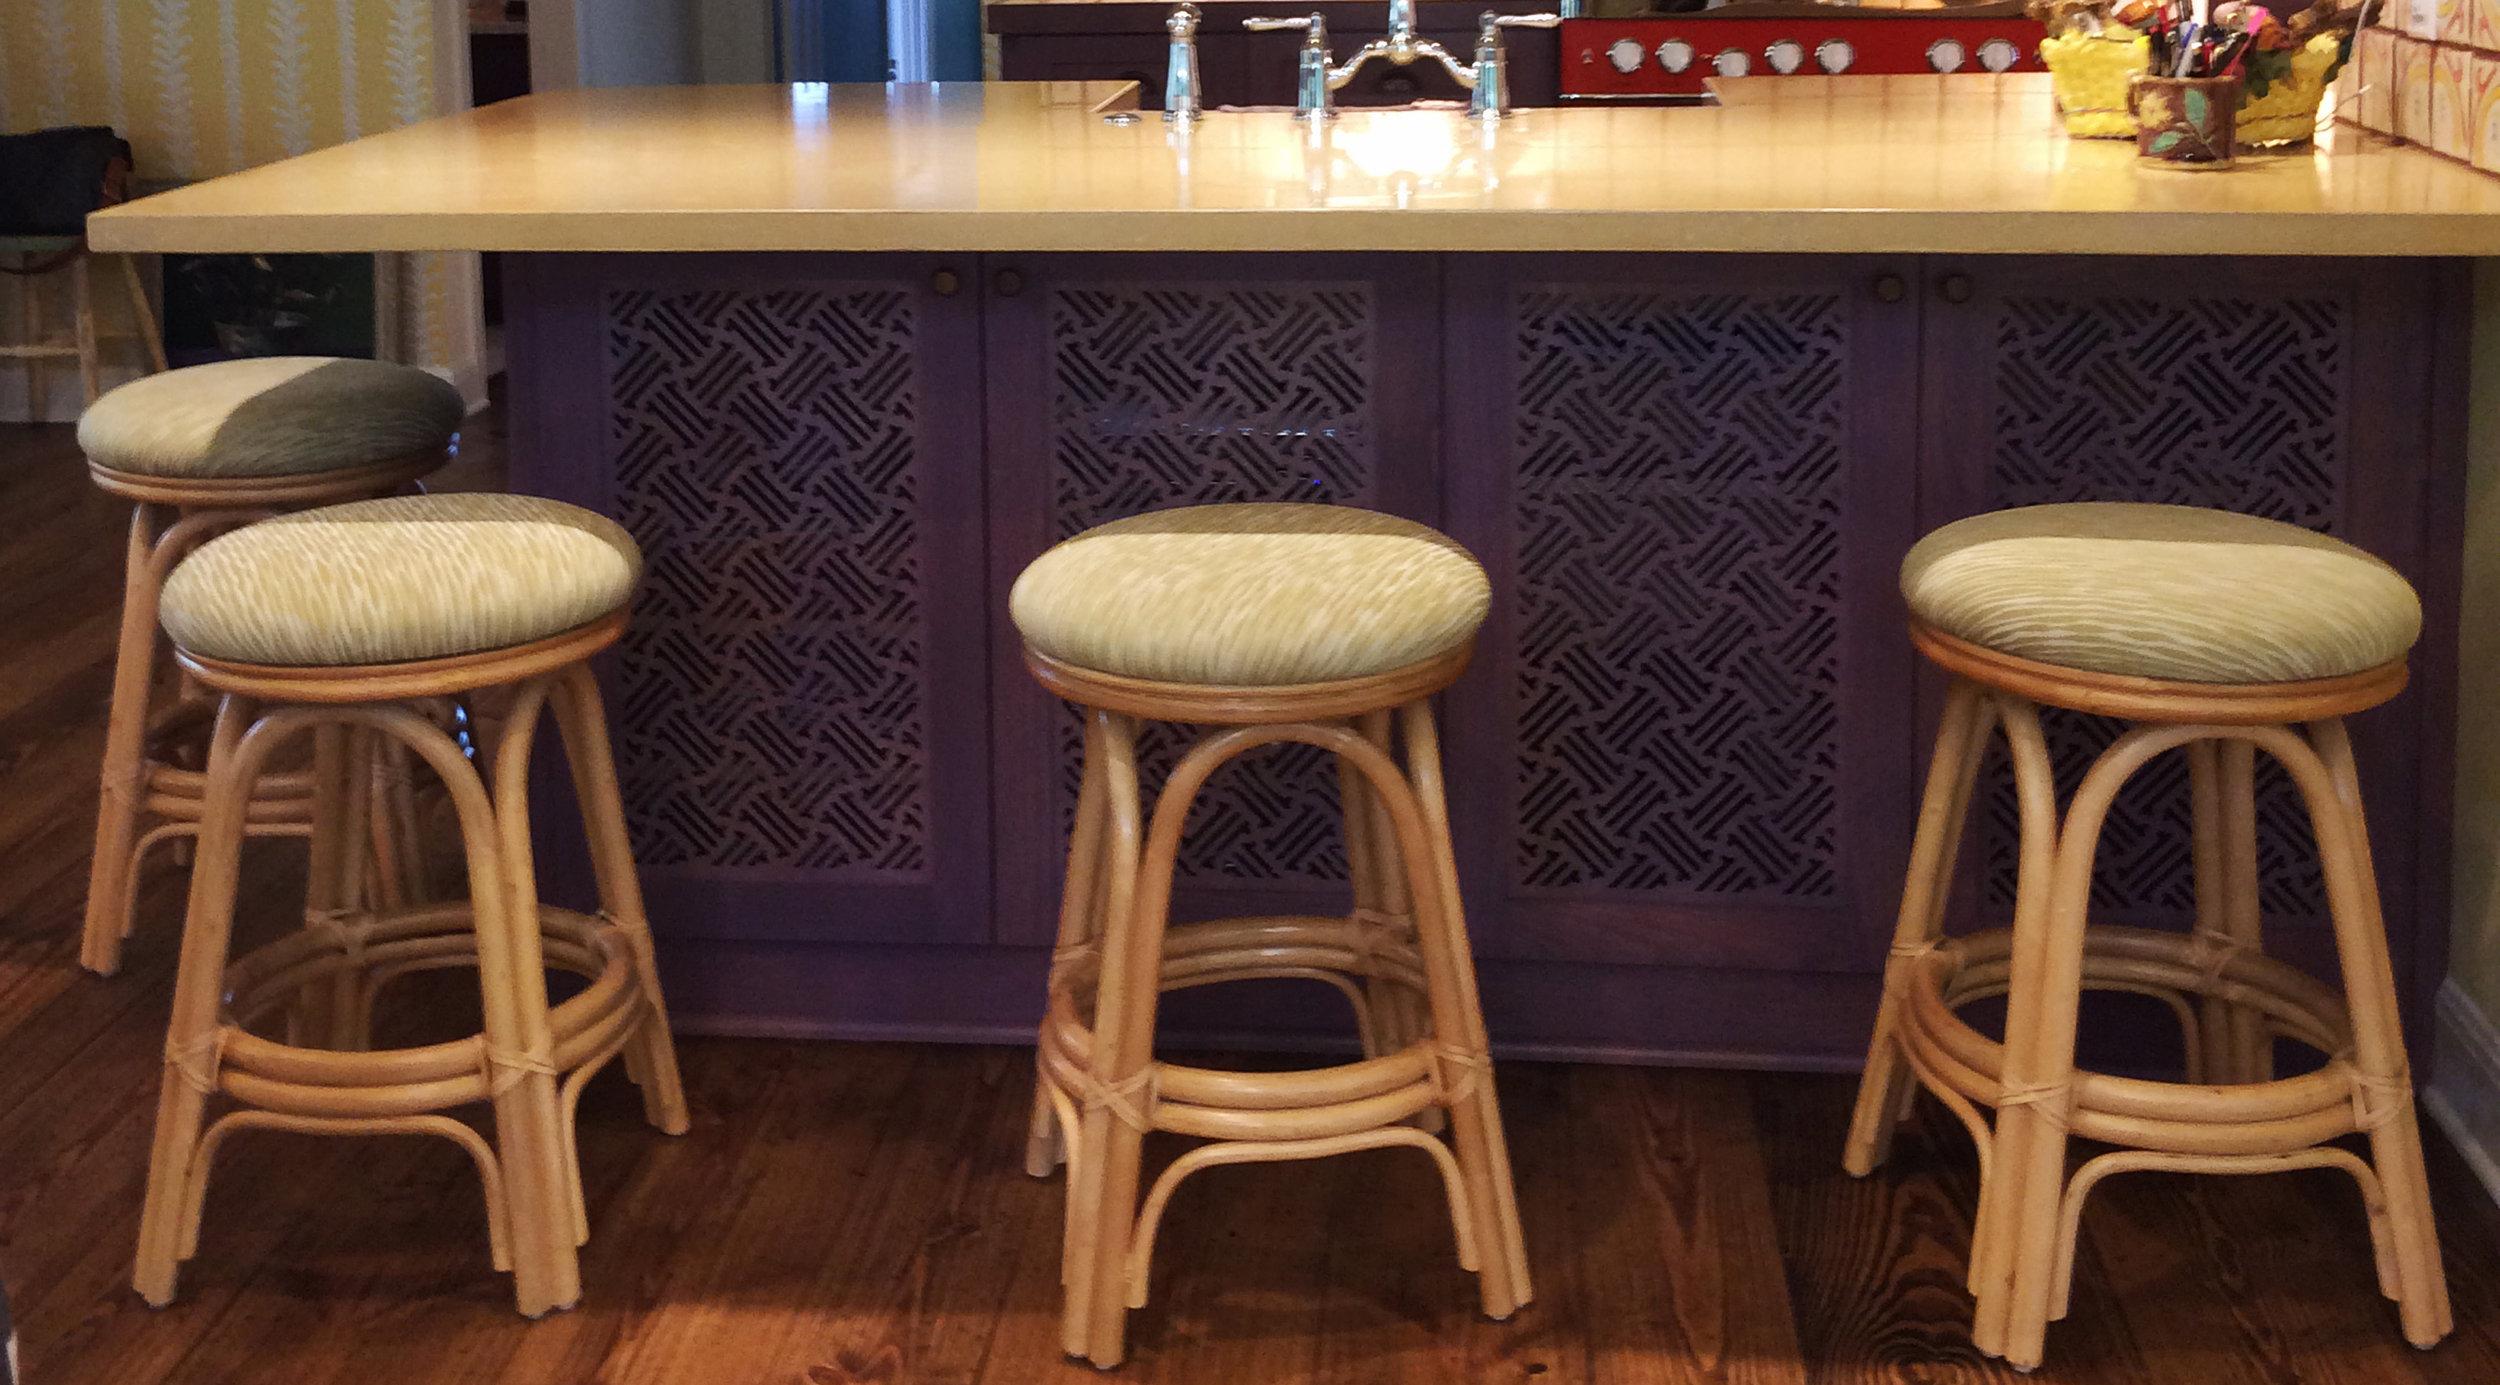 Residence,Austin, TX   Hawaiian pattern, Kitchen cabinets and island